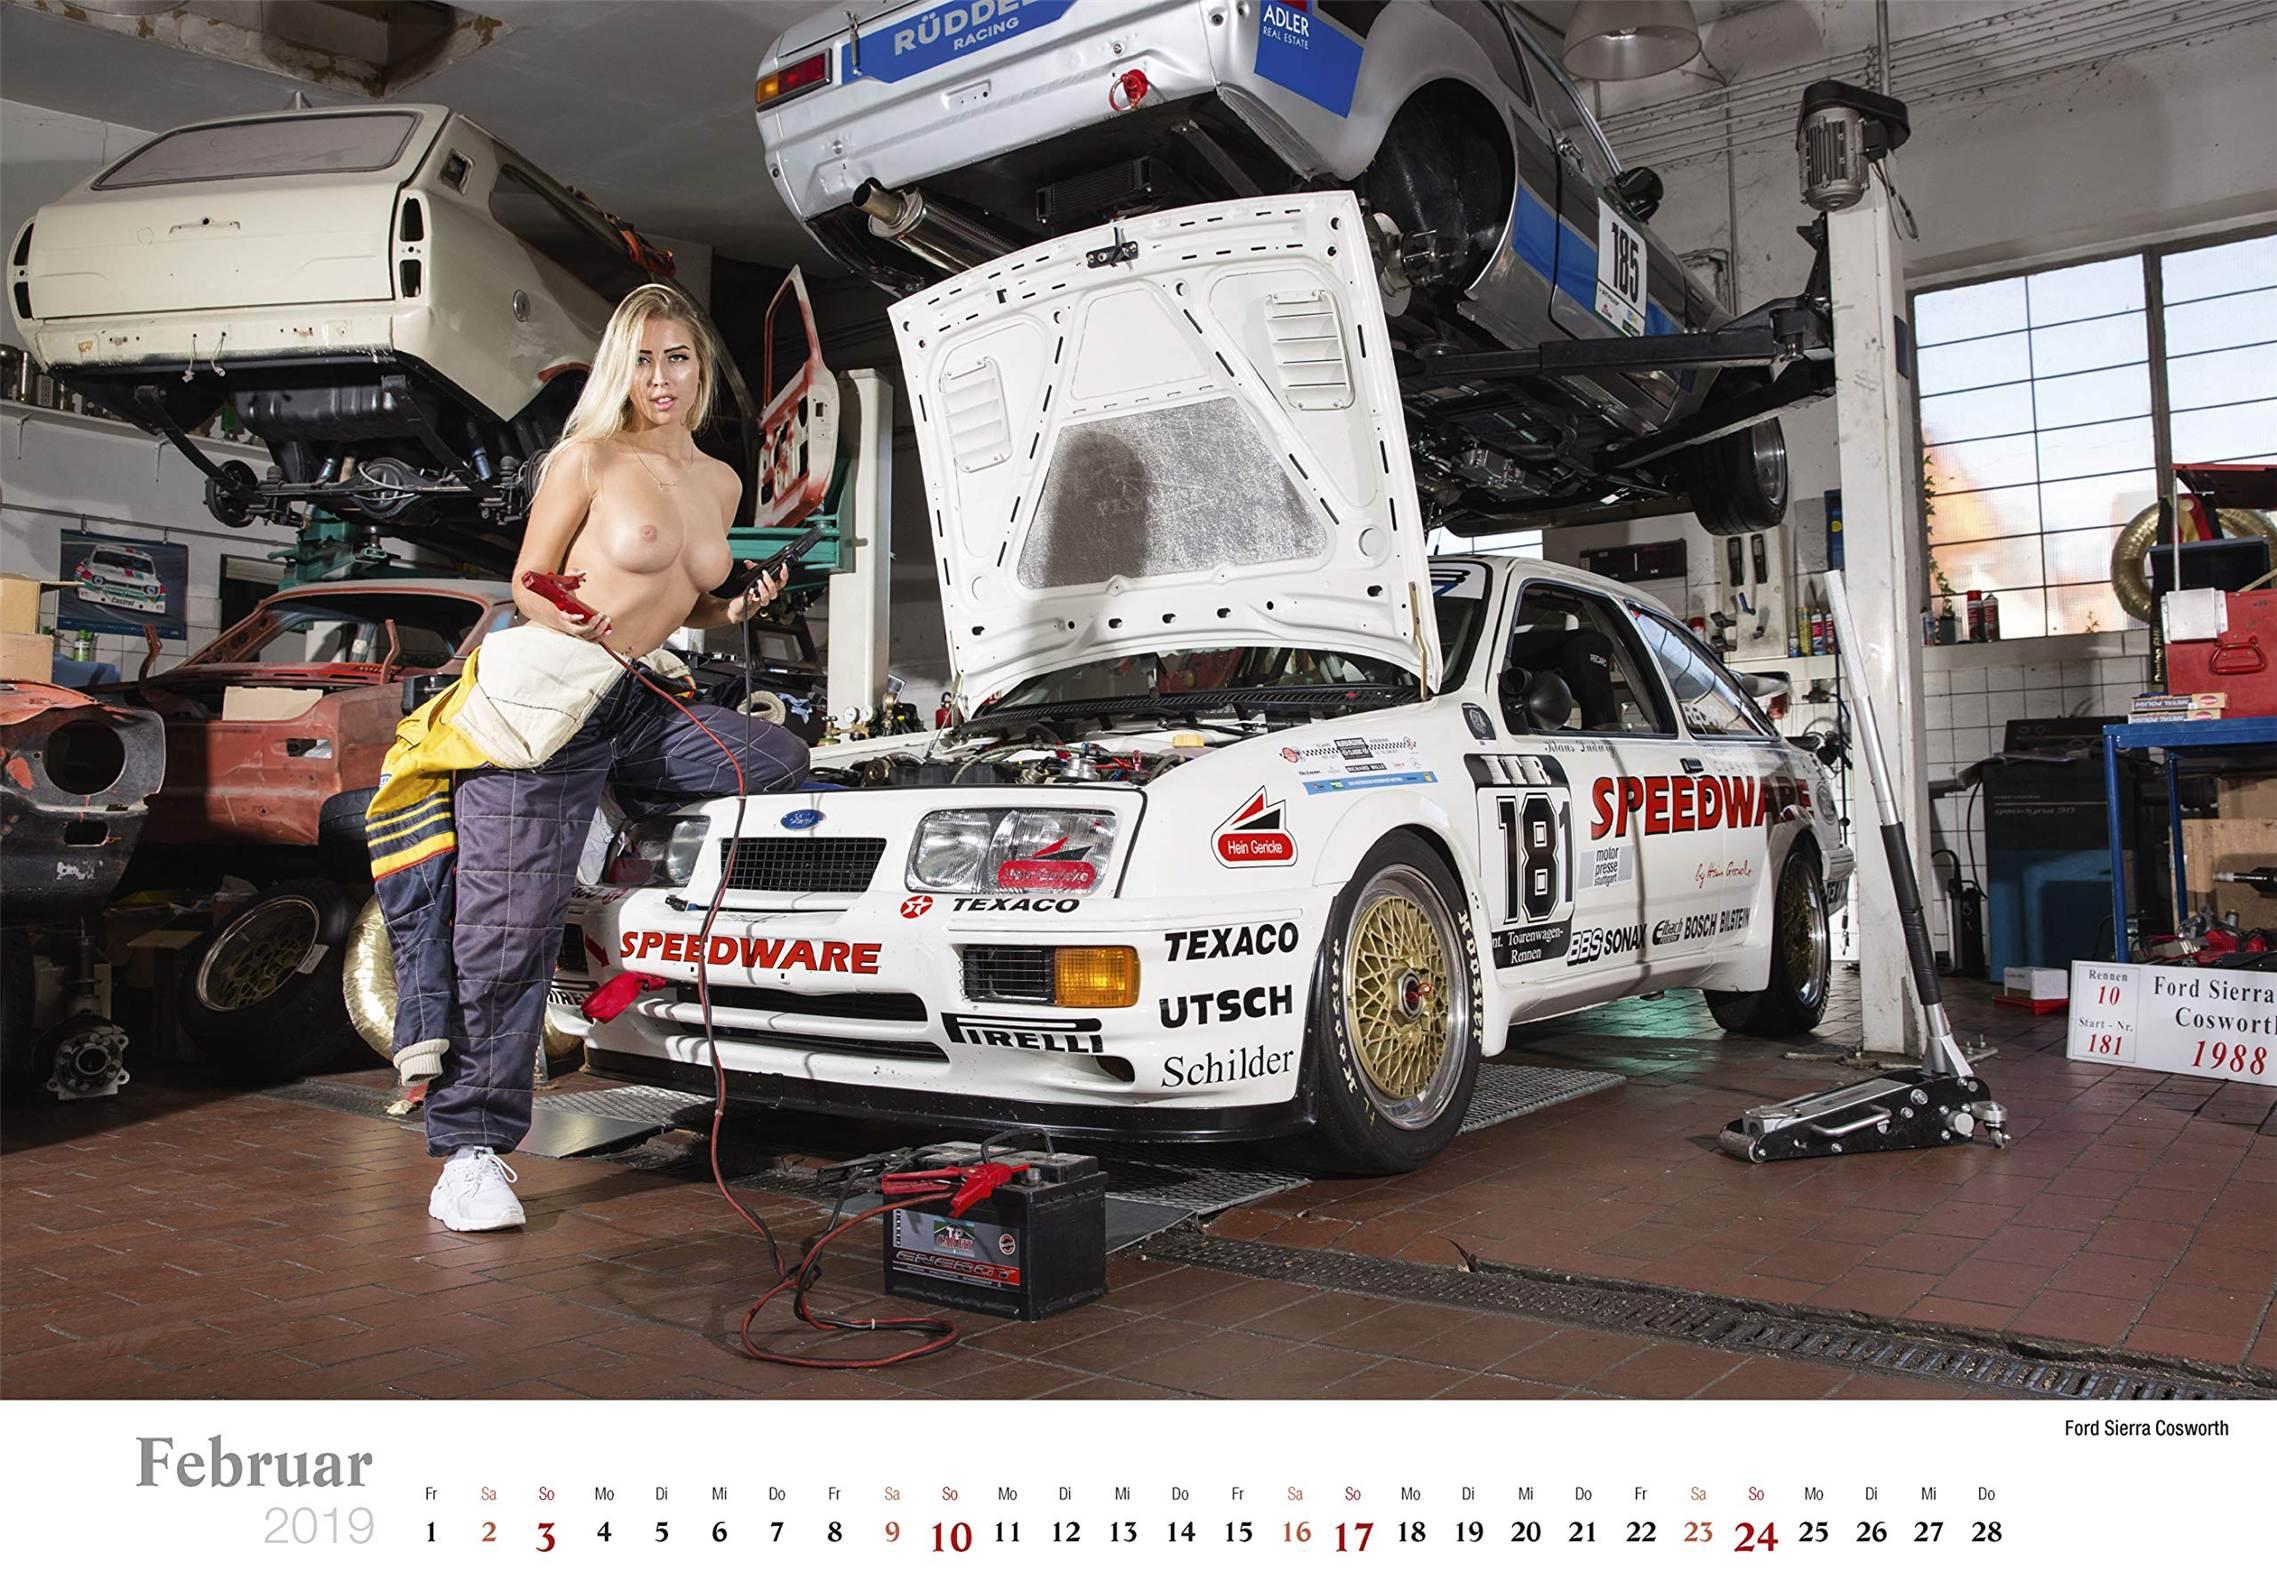 Сексуальные девушки ремонтируют автомобили / Ford Sierra Cosworth / Schraubertraume / 2019 erotic calendar by Frank Lutzeback